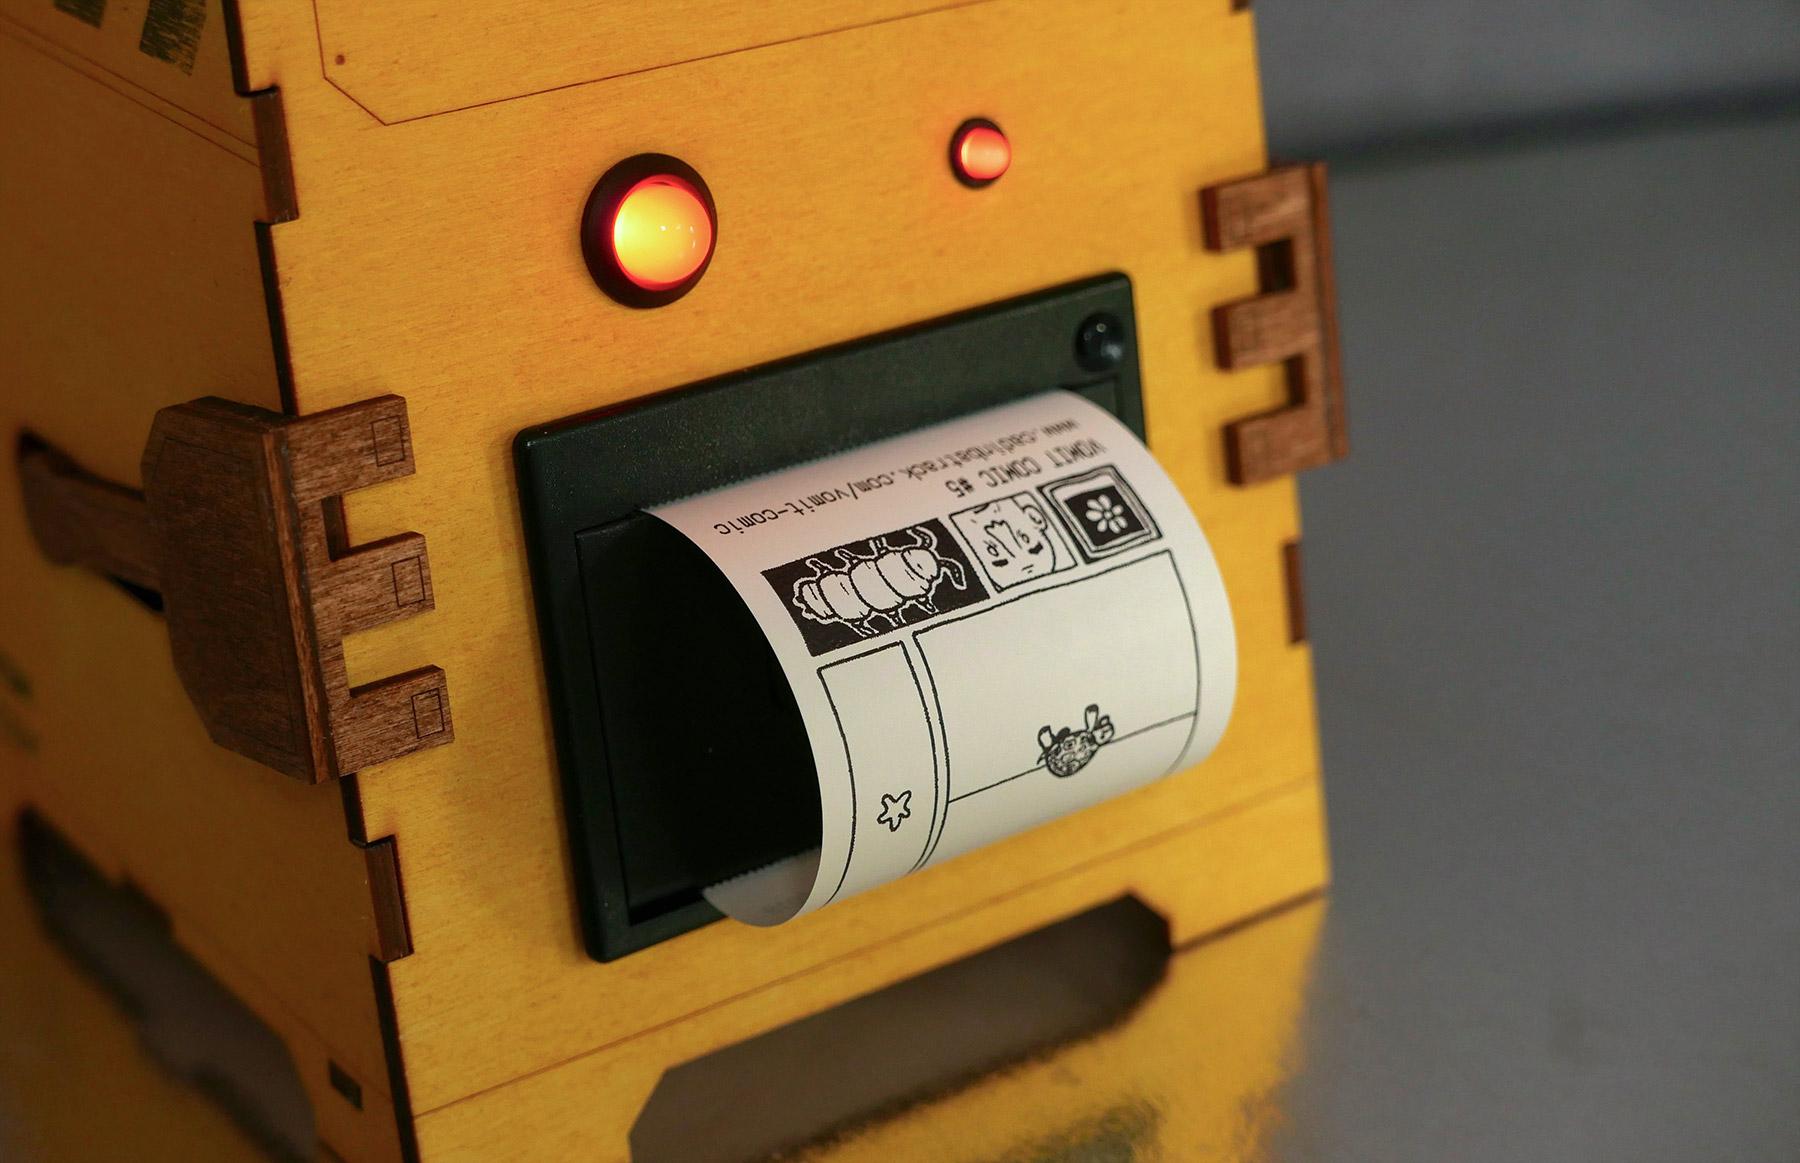 Comic Vomit Robot Cadin Batrack's Raspberry Pi comic-generating machine